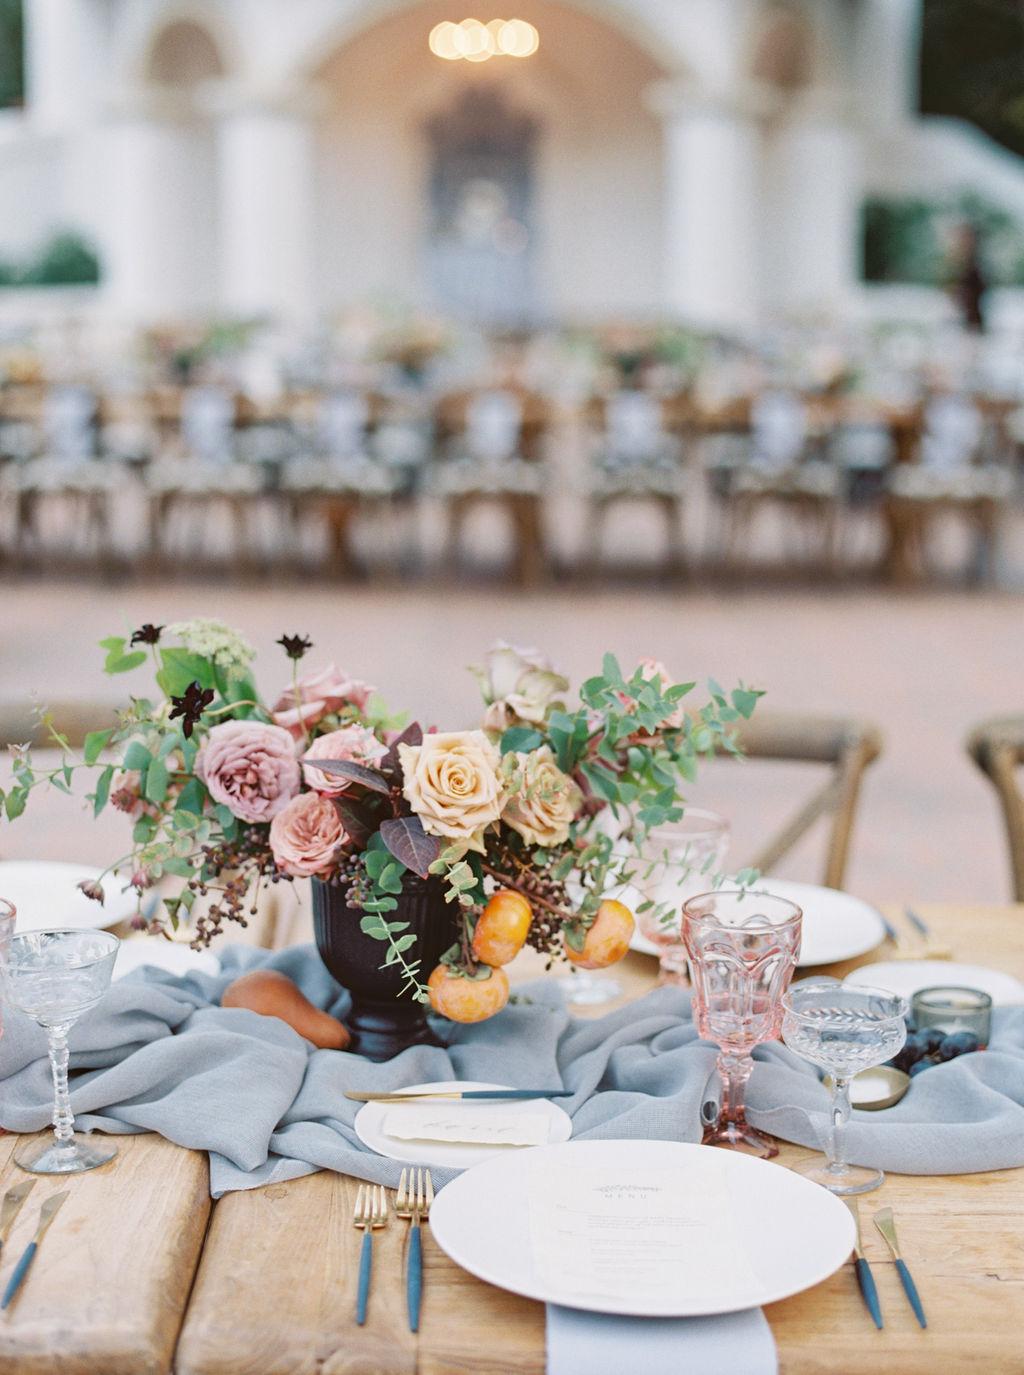 Autumn Wedding Flowers by Megan Wise